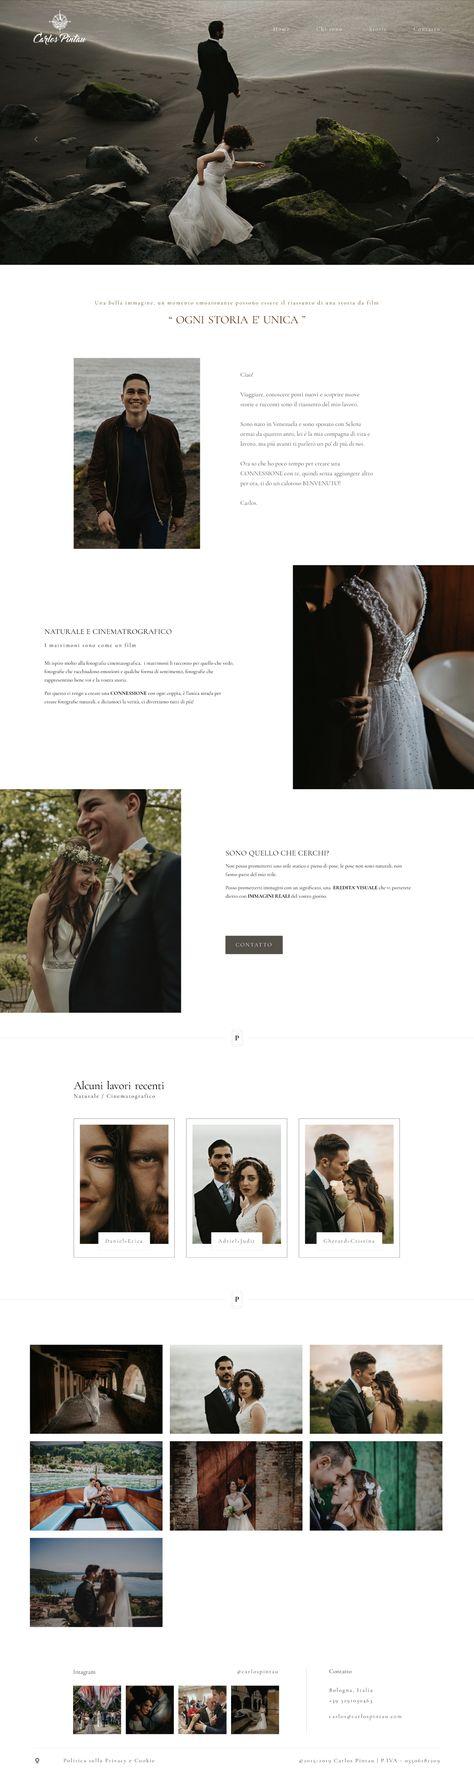 Wedding Photography Website Design - Porto II WordPress Theme by Flothemes.com